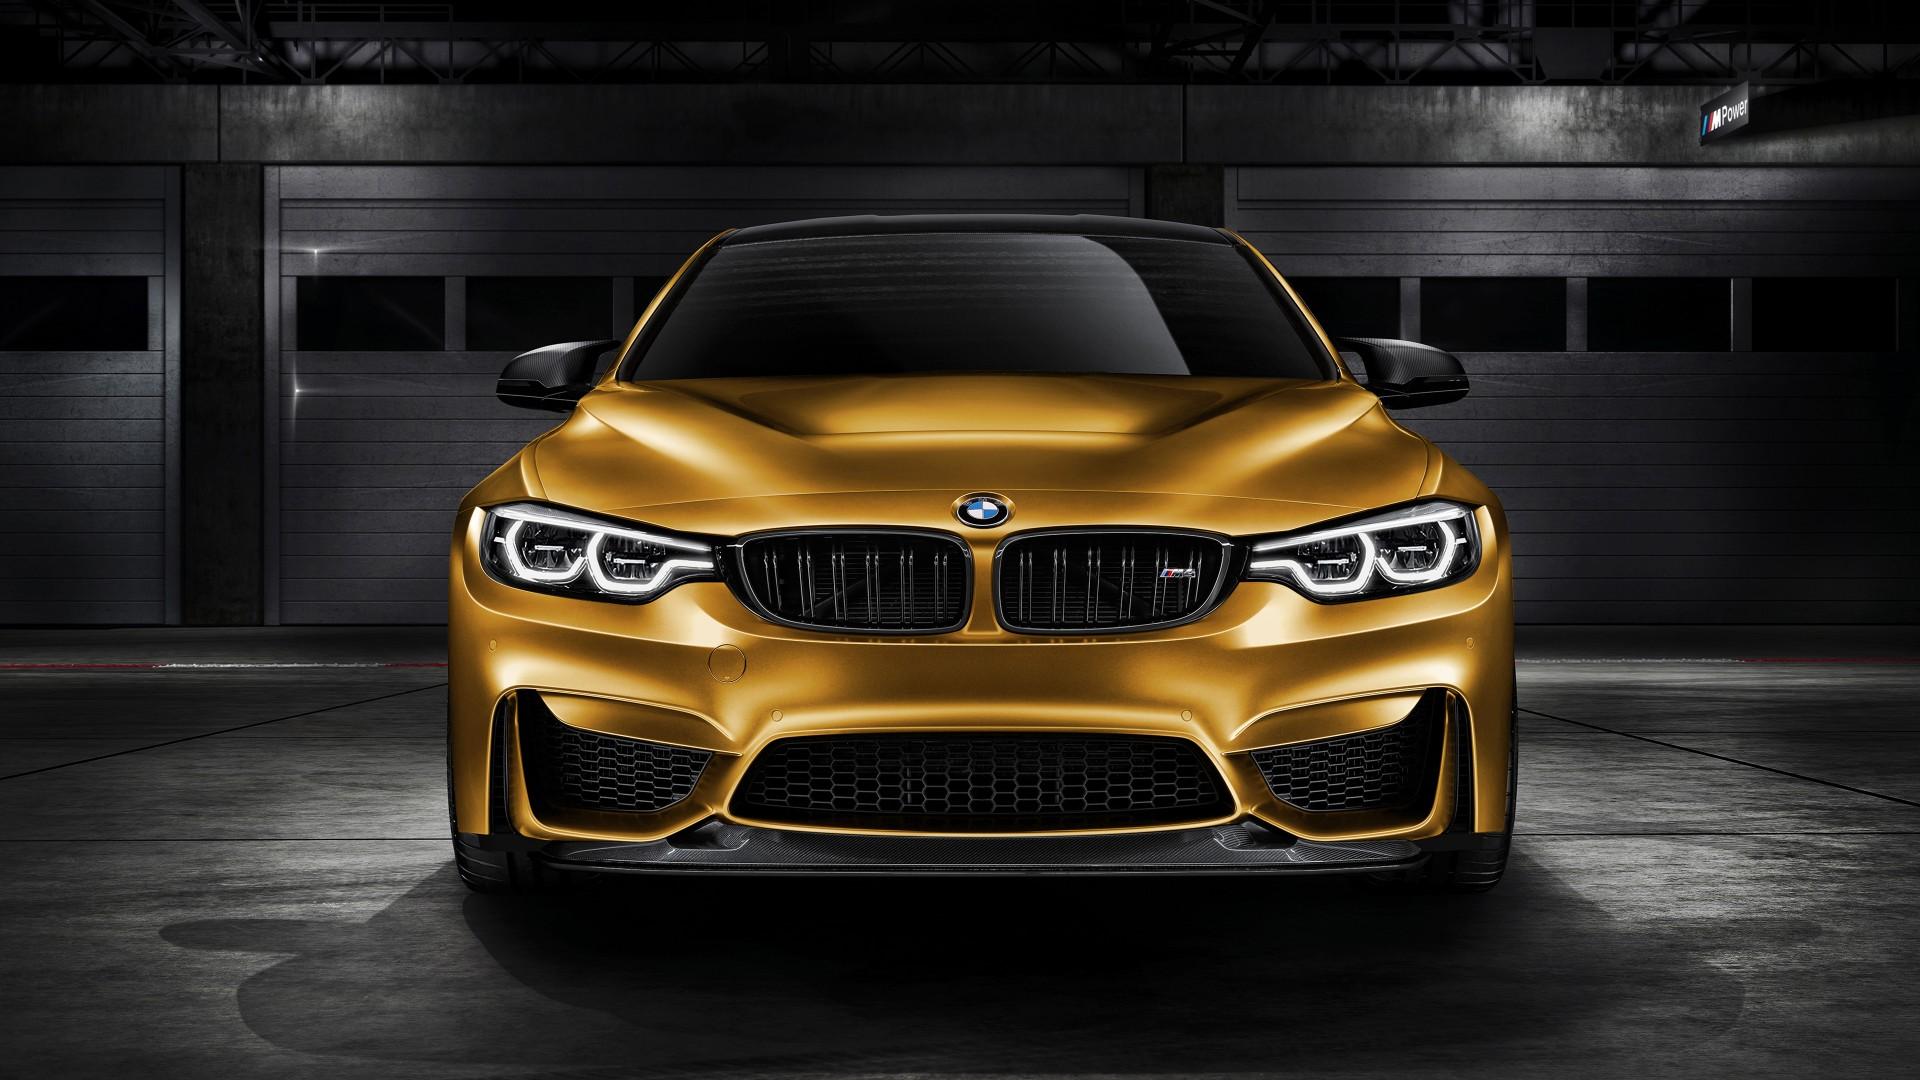 Iphone X Gold Wallpaper Bmw M4 Gts Sunburstgold 2018 4k Wallpaper Hd Car